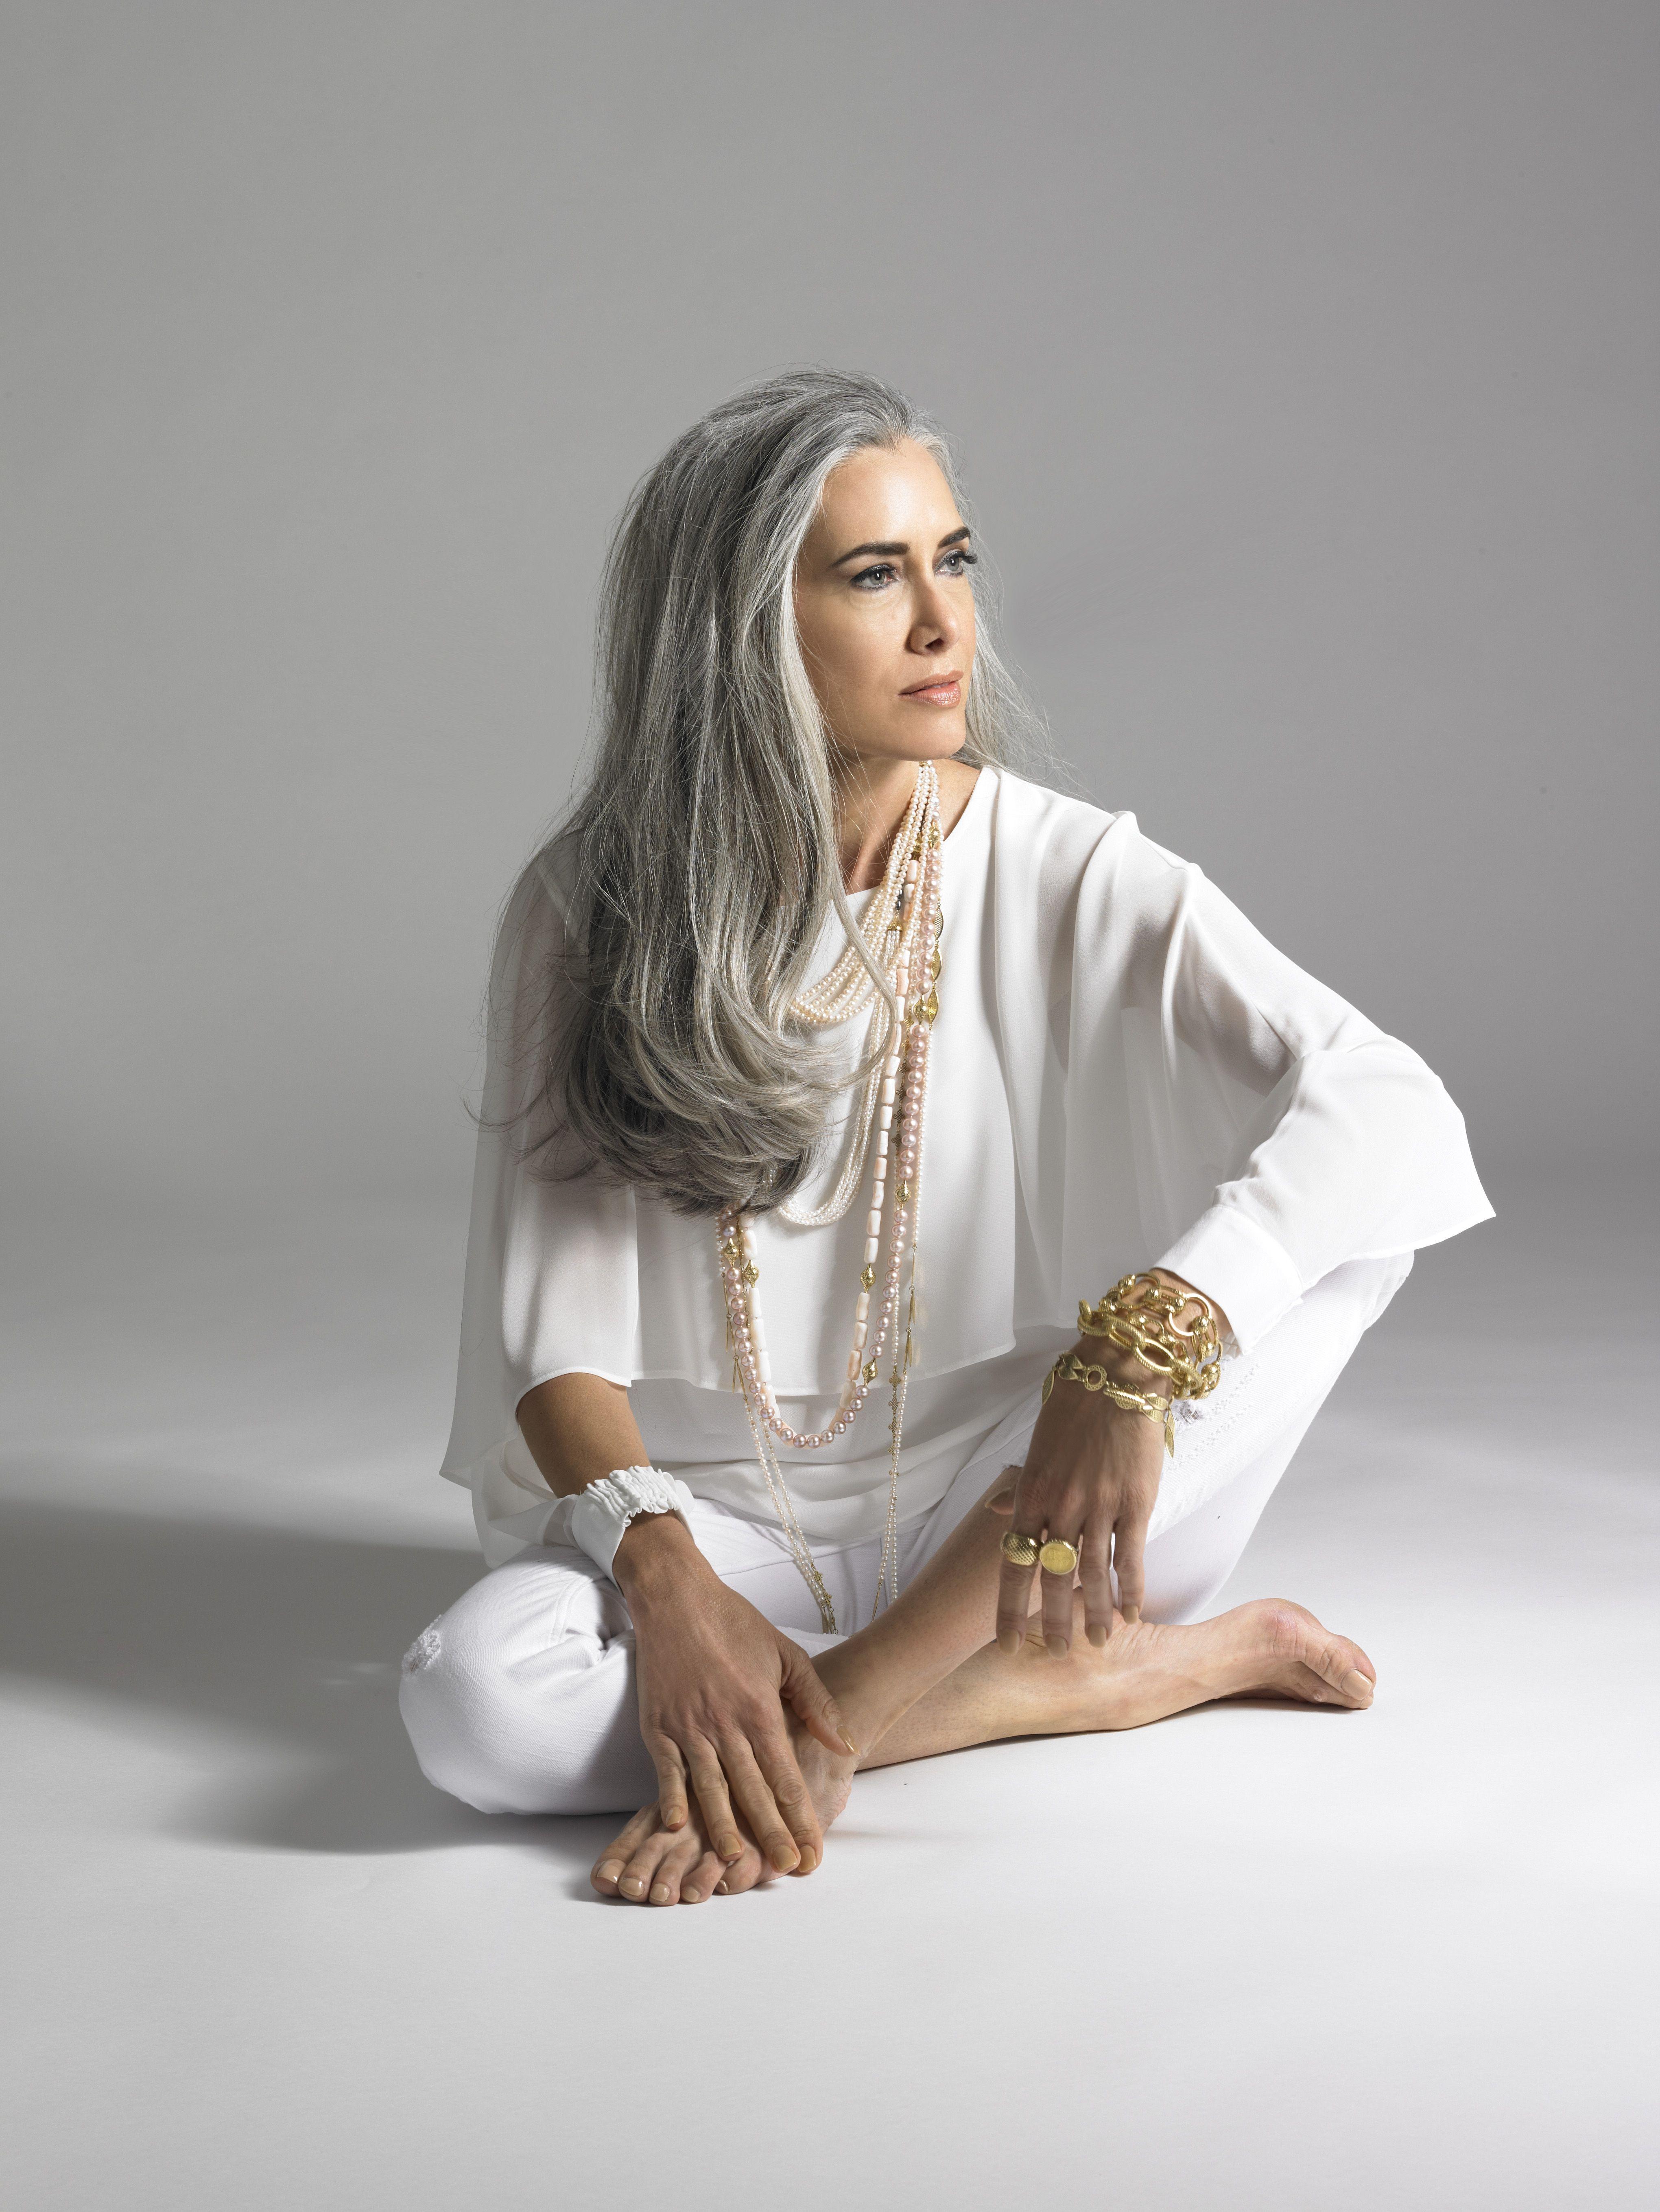 Manon Crespi for Ray Griffiths Jewelry Invecchiare Bene d3139d463f83